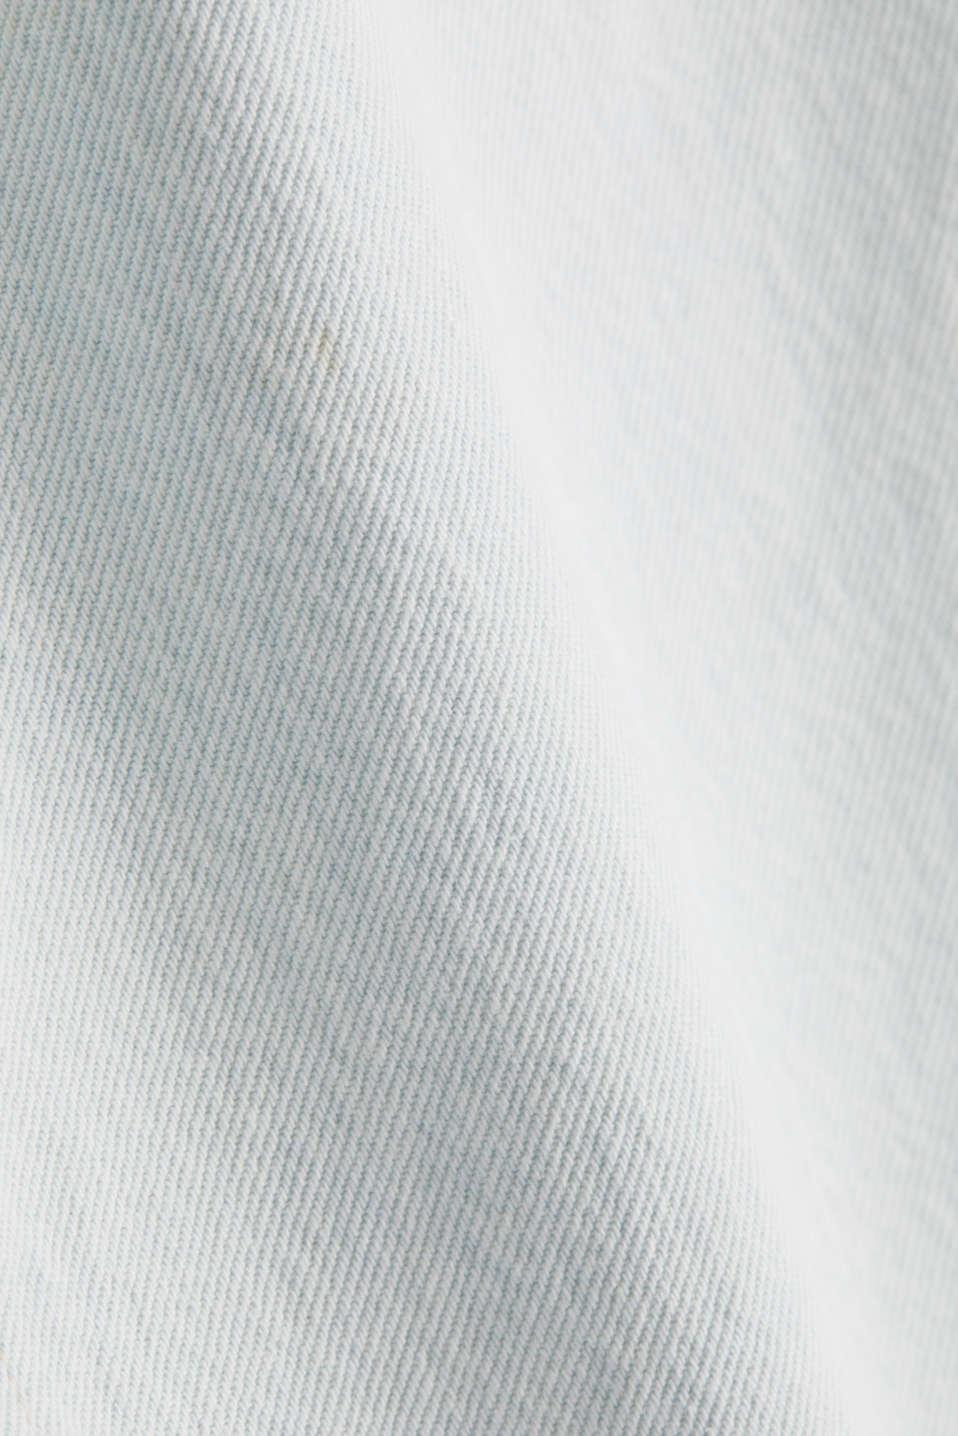 Denim skirt in 100% cotton, BLUE BLEACHED, detail image number 4